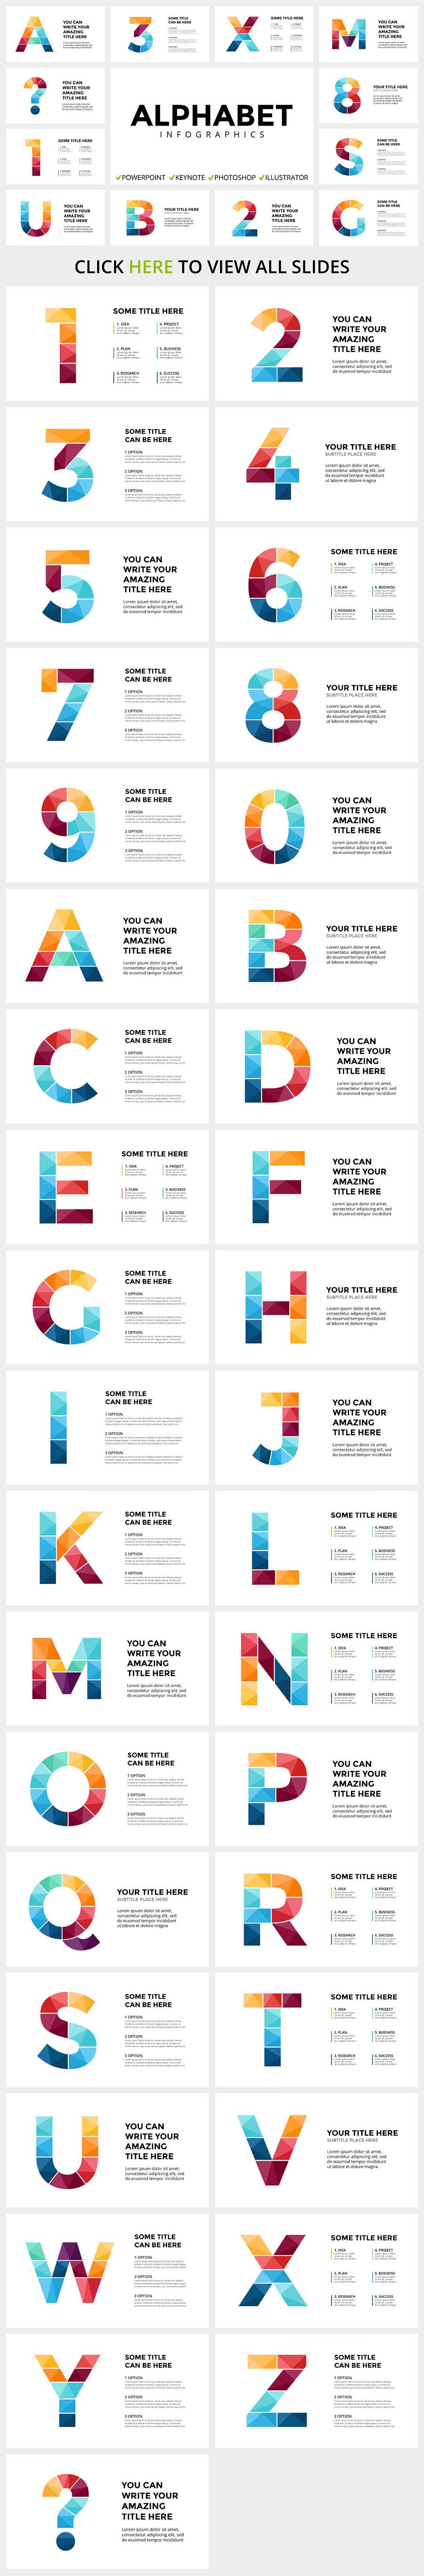 Cool Infographics in 2020. Best Infographics Bundle: 1500 items - $29 - 13 ALPHABET